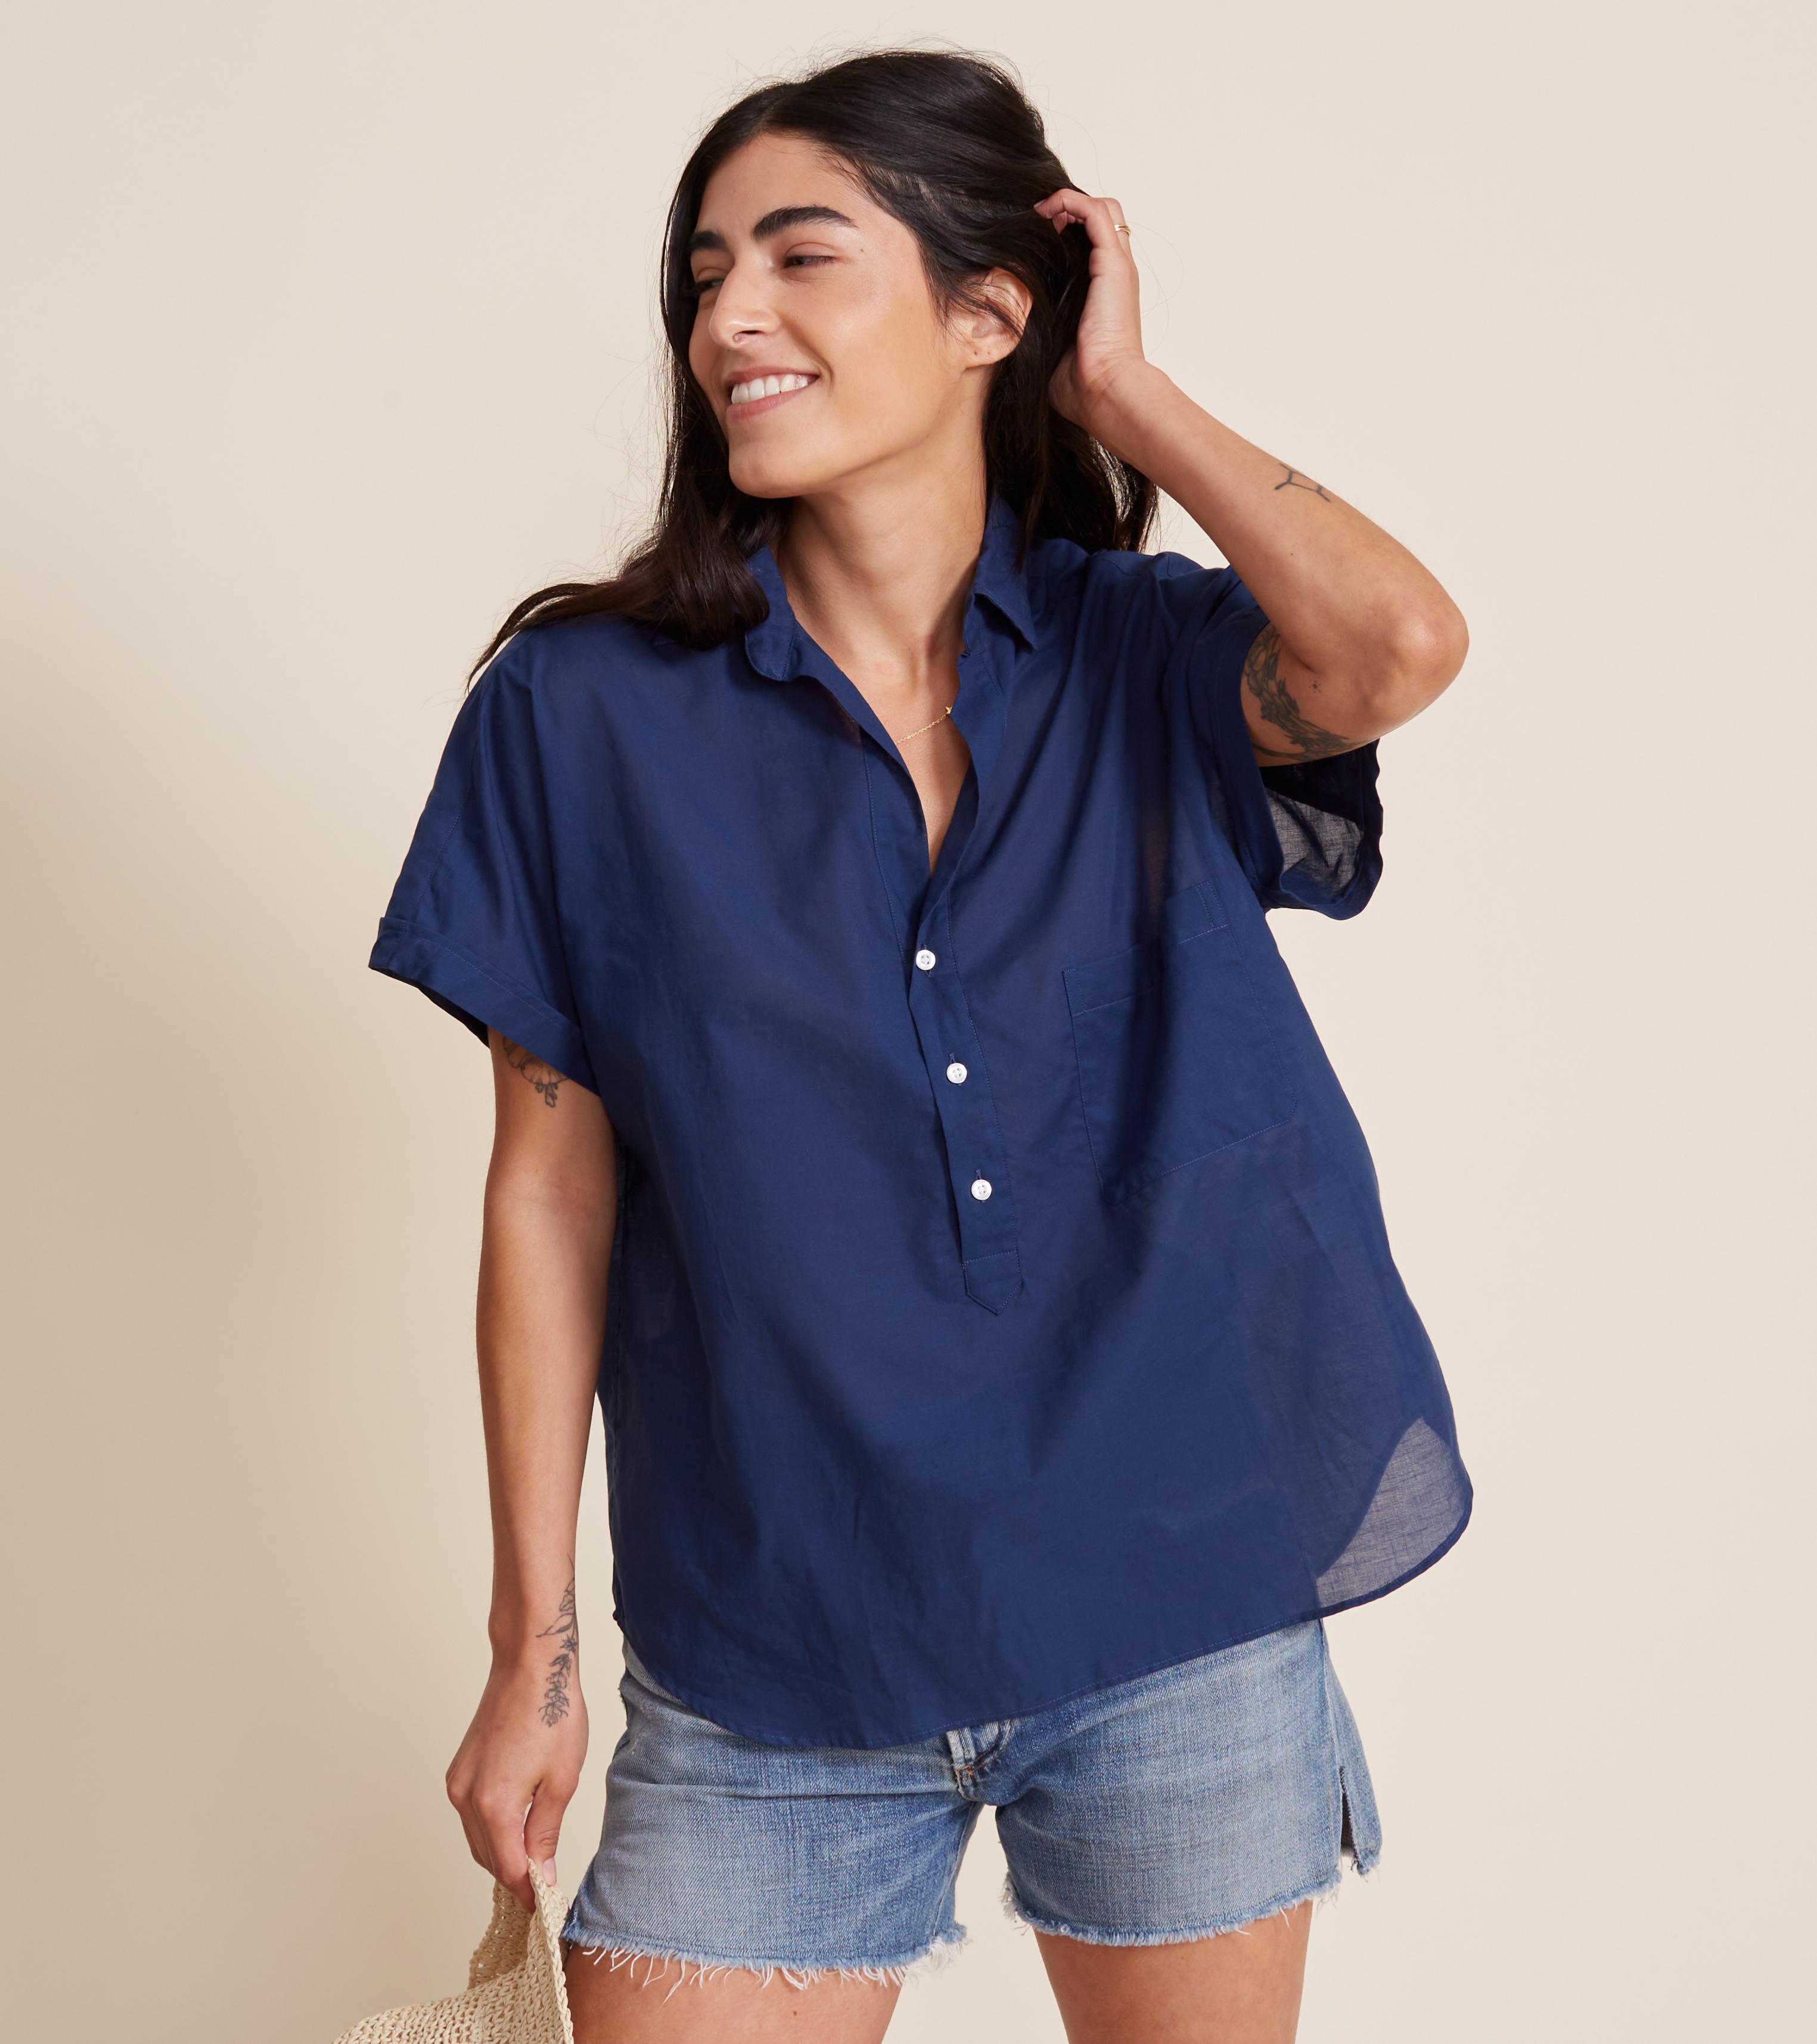 Image of The Artist Short Sleeve Shirt Navy, Tissue Cotton